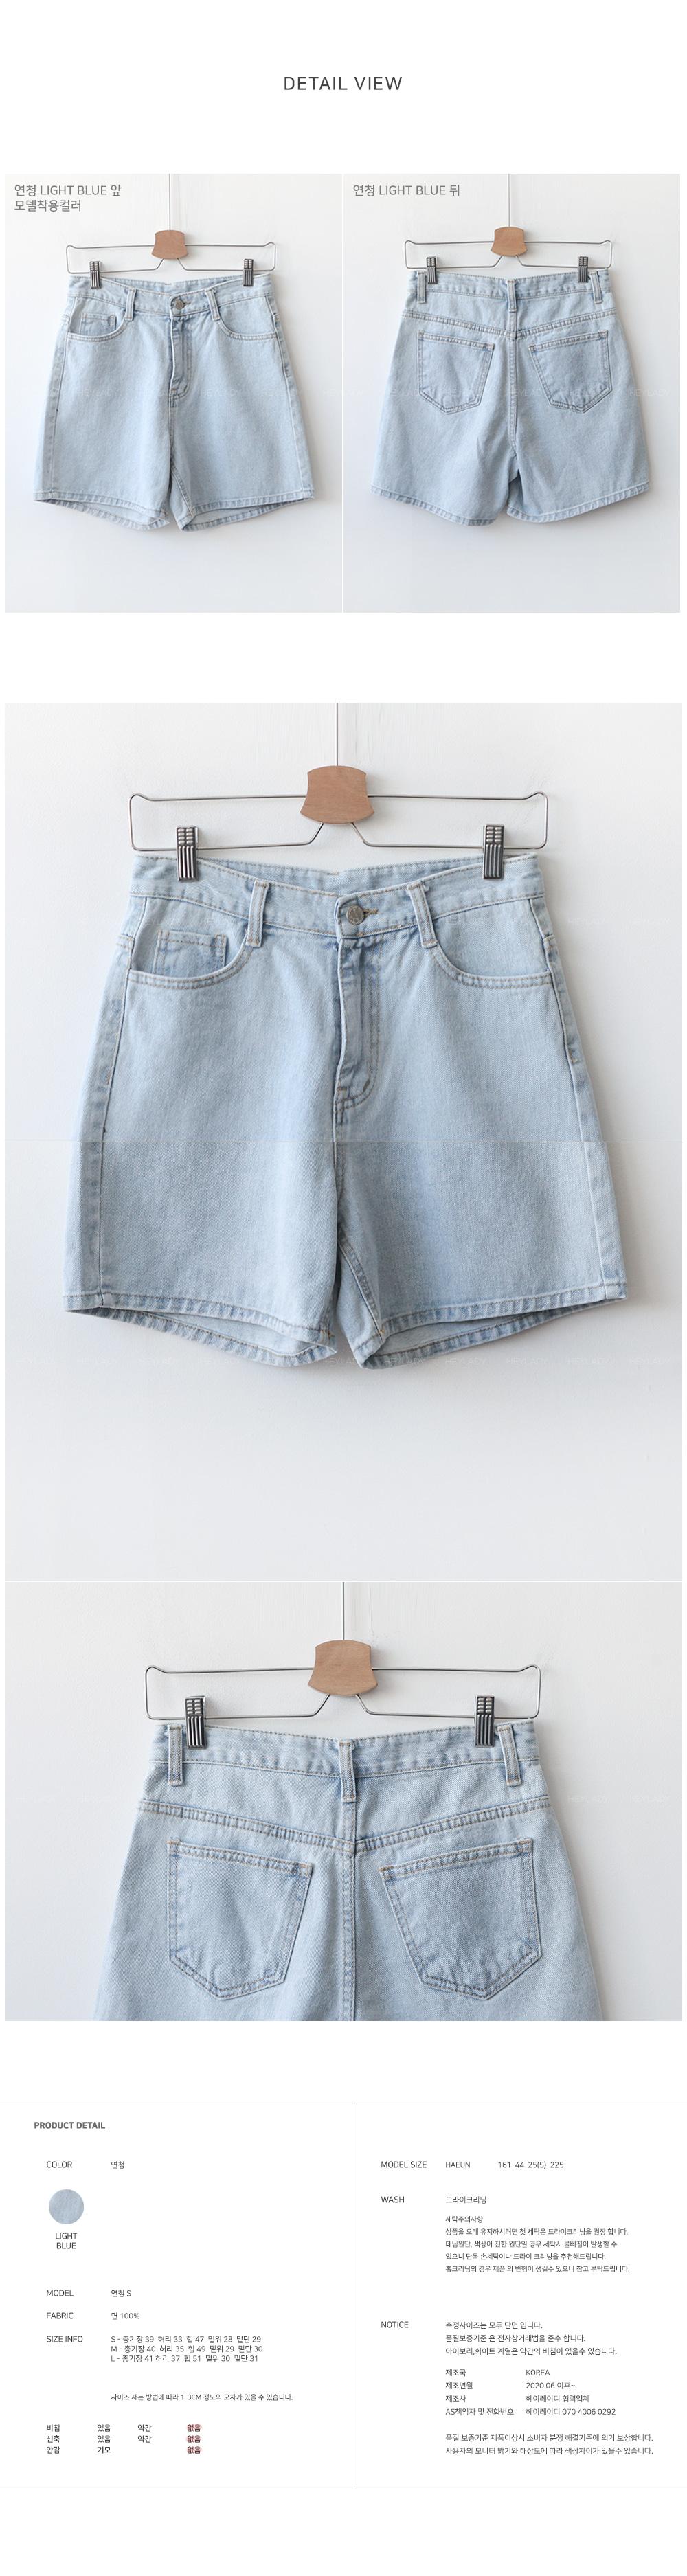 Internet denim short pants